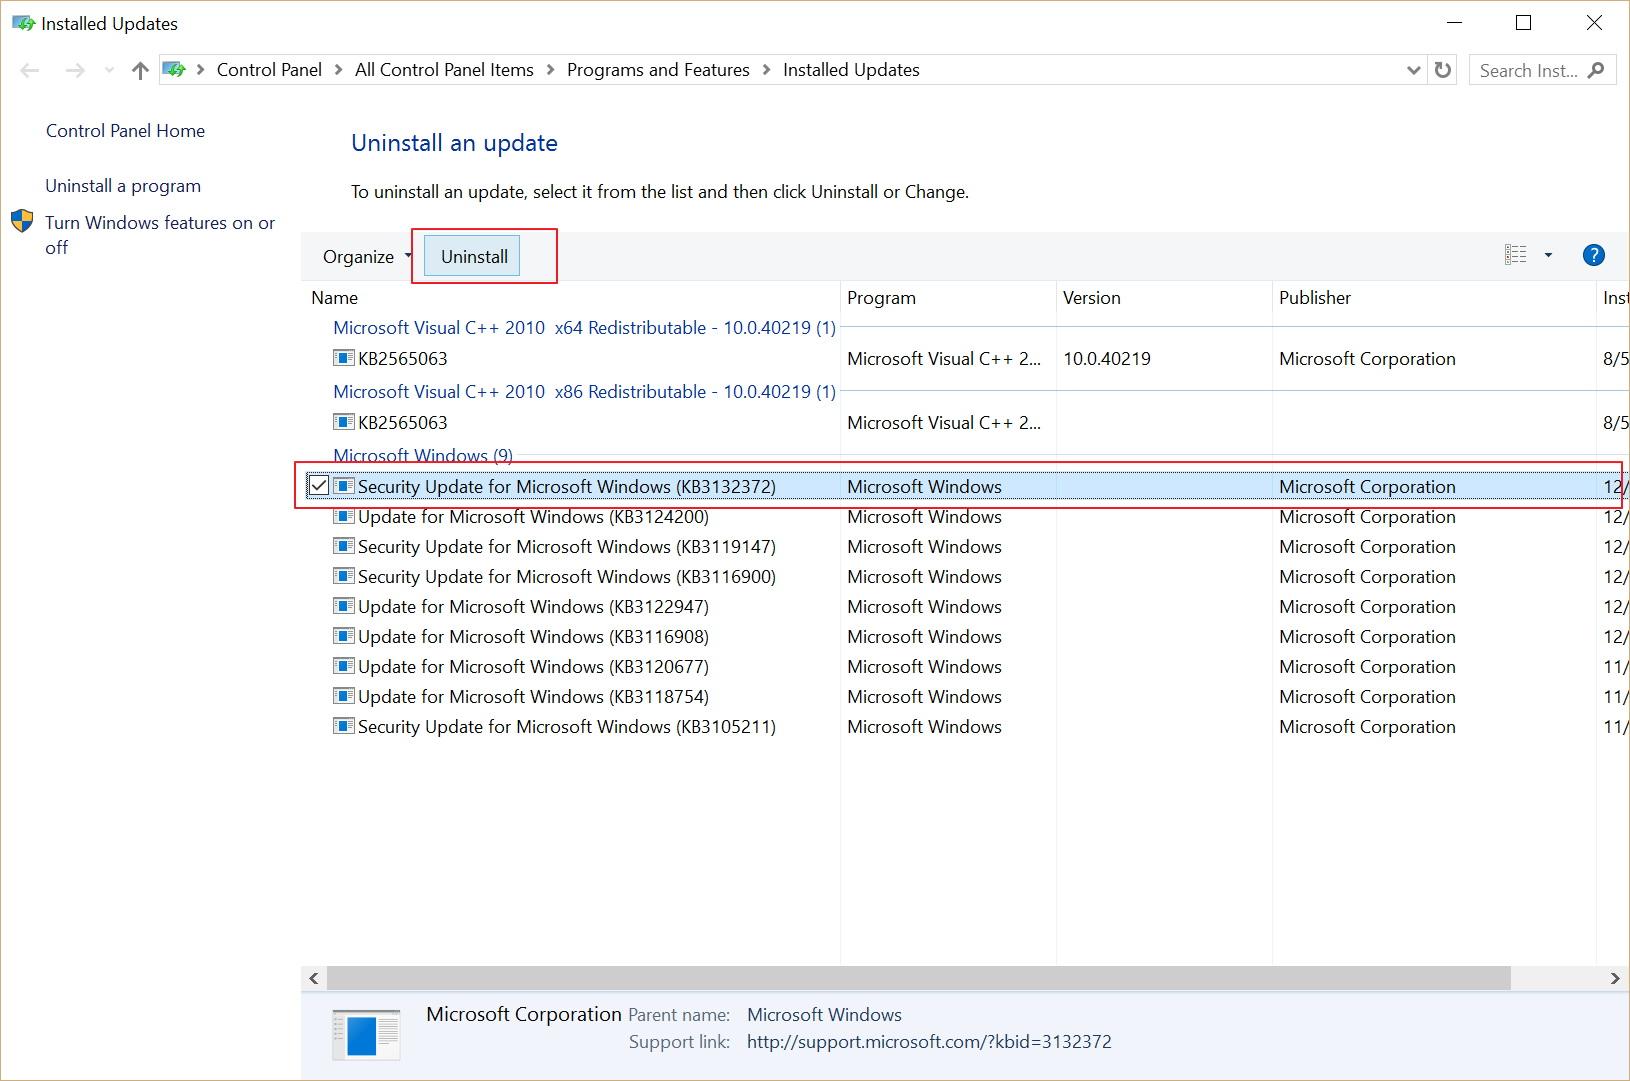 Uninstall a Windows update